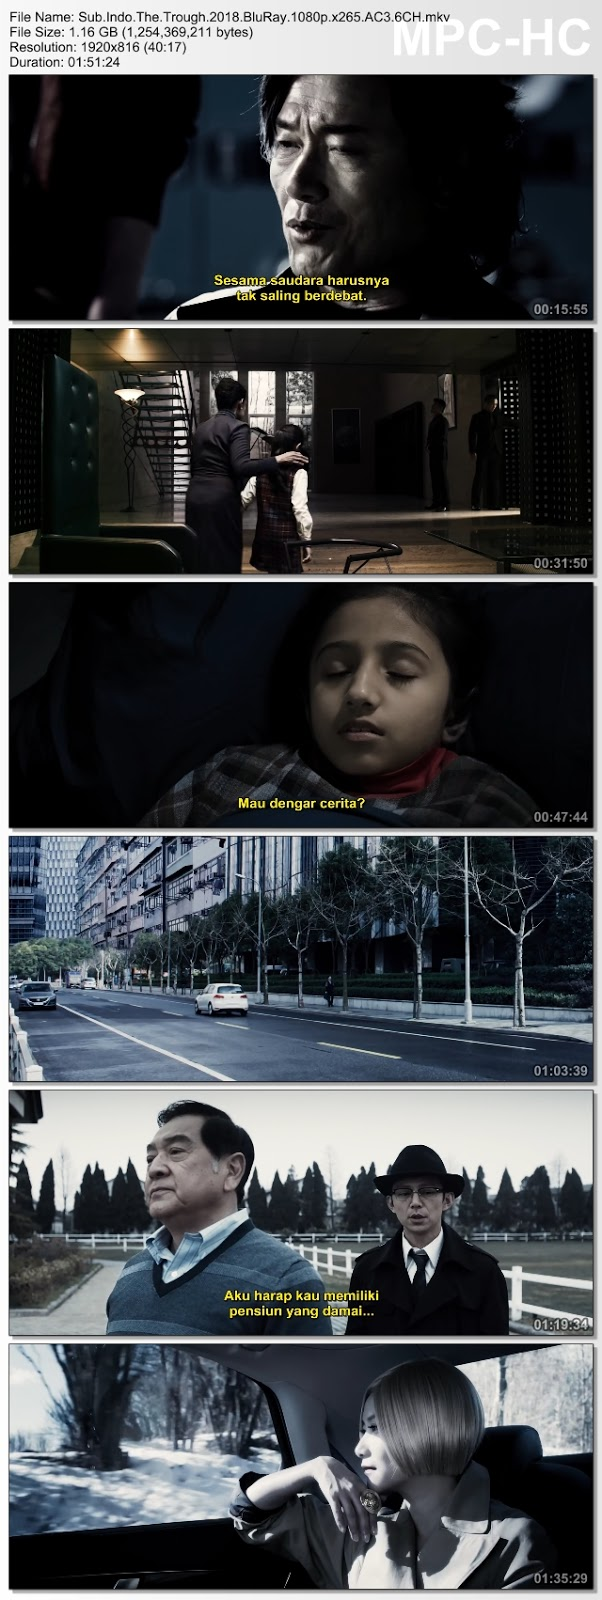 Screenshots Download Di ya cao (2018) BluRay 480p & 3GP Subtitle Indonesia